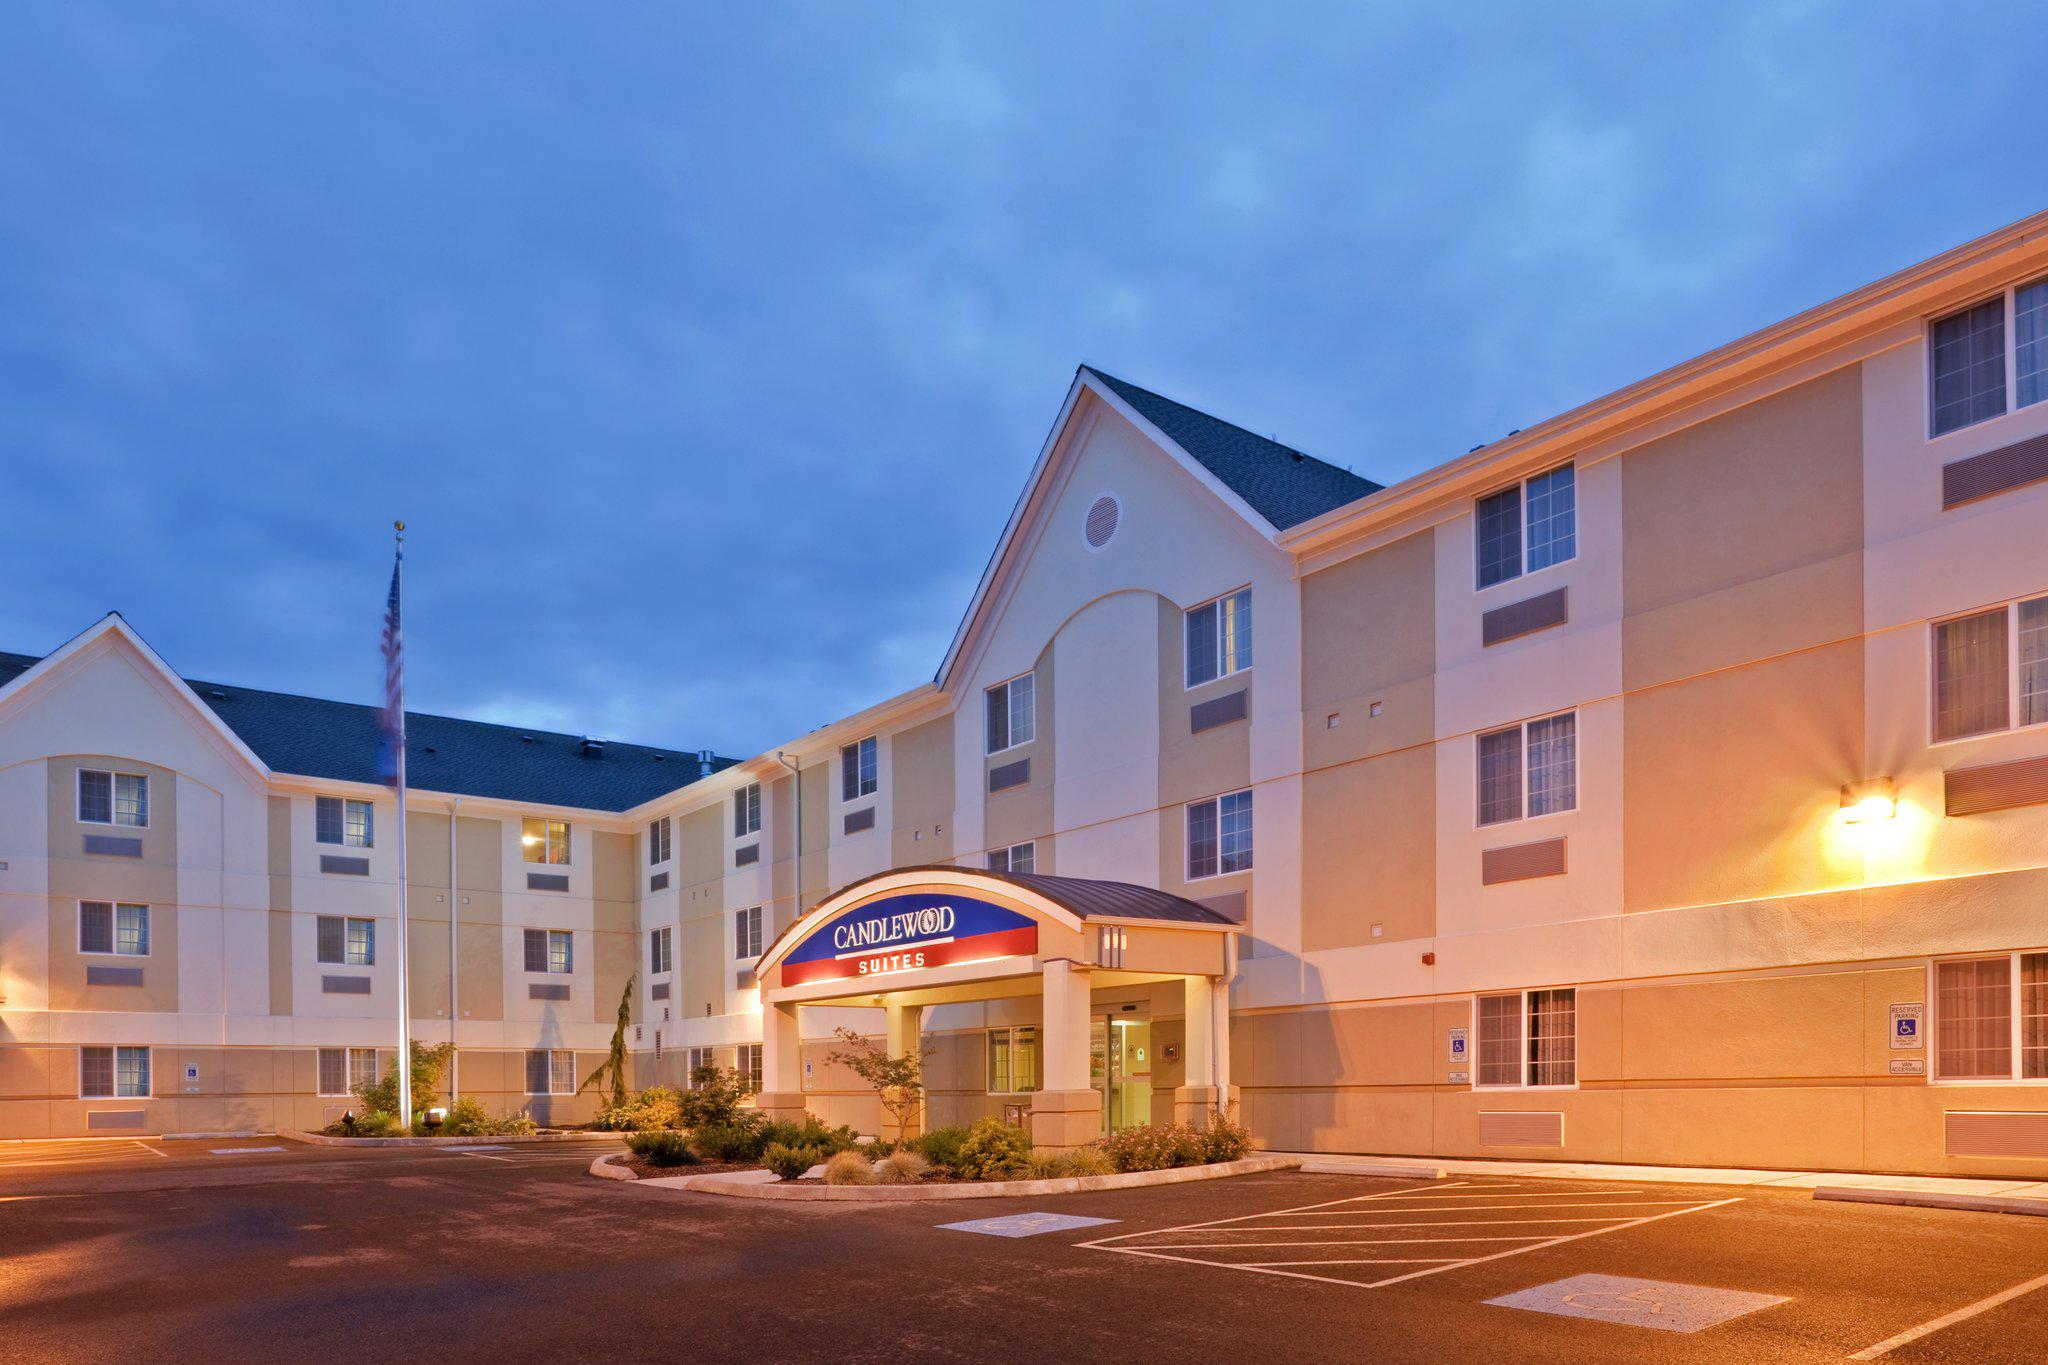 Candlewood Suites Oak Harbor in Oak Harbor, WA, photo #2